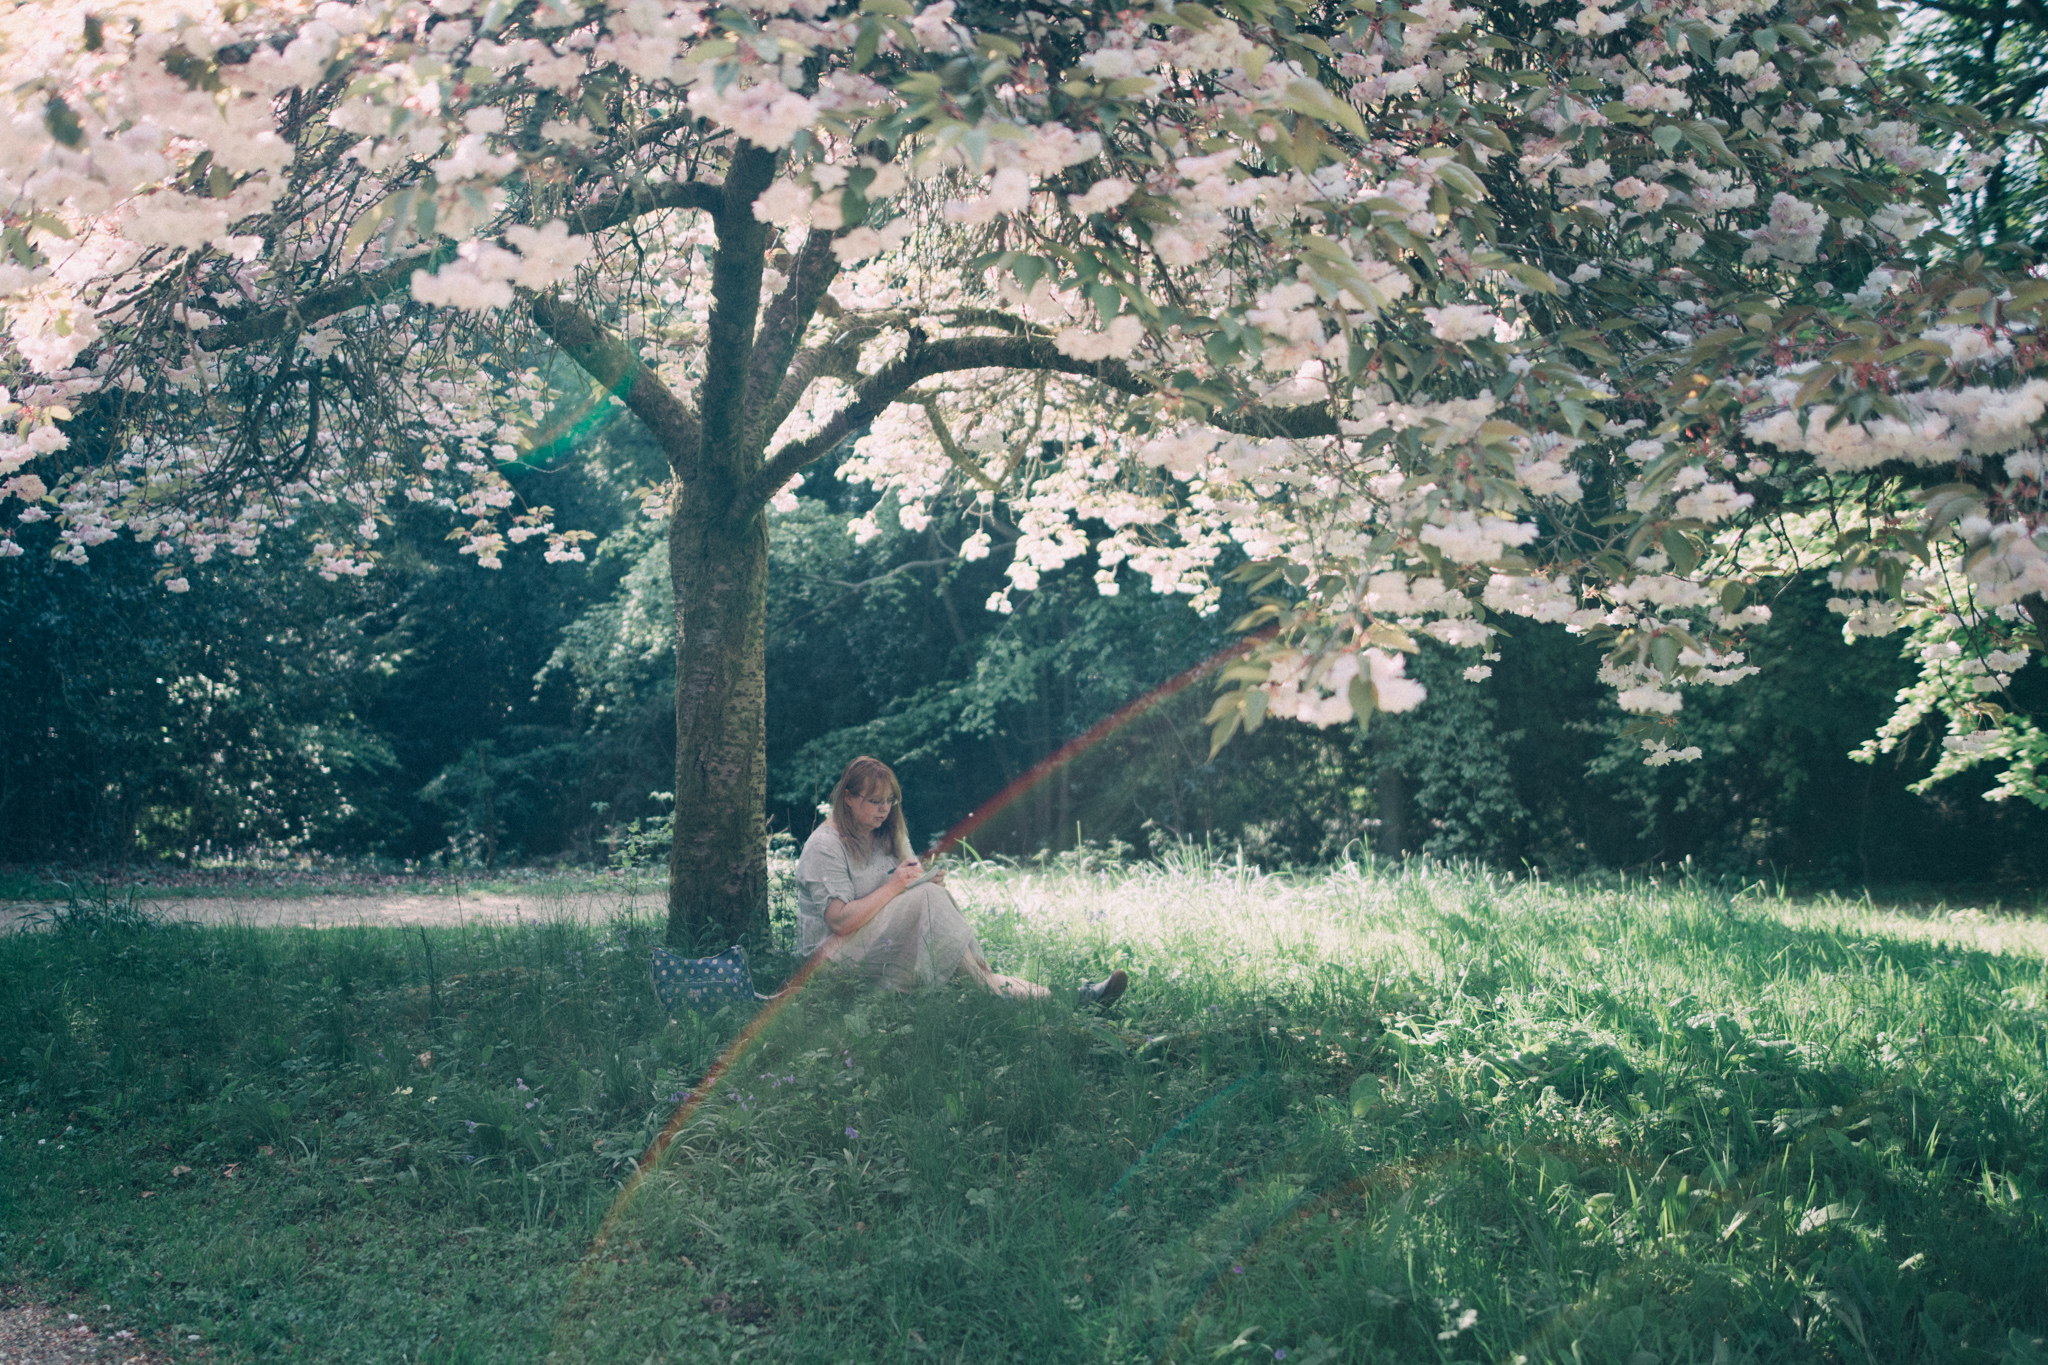 british blogger sitting on the grass under a blossom tree